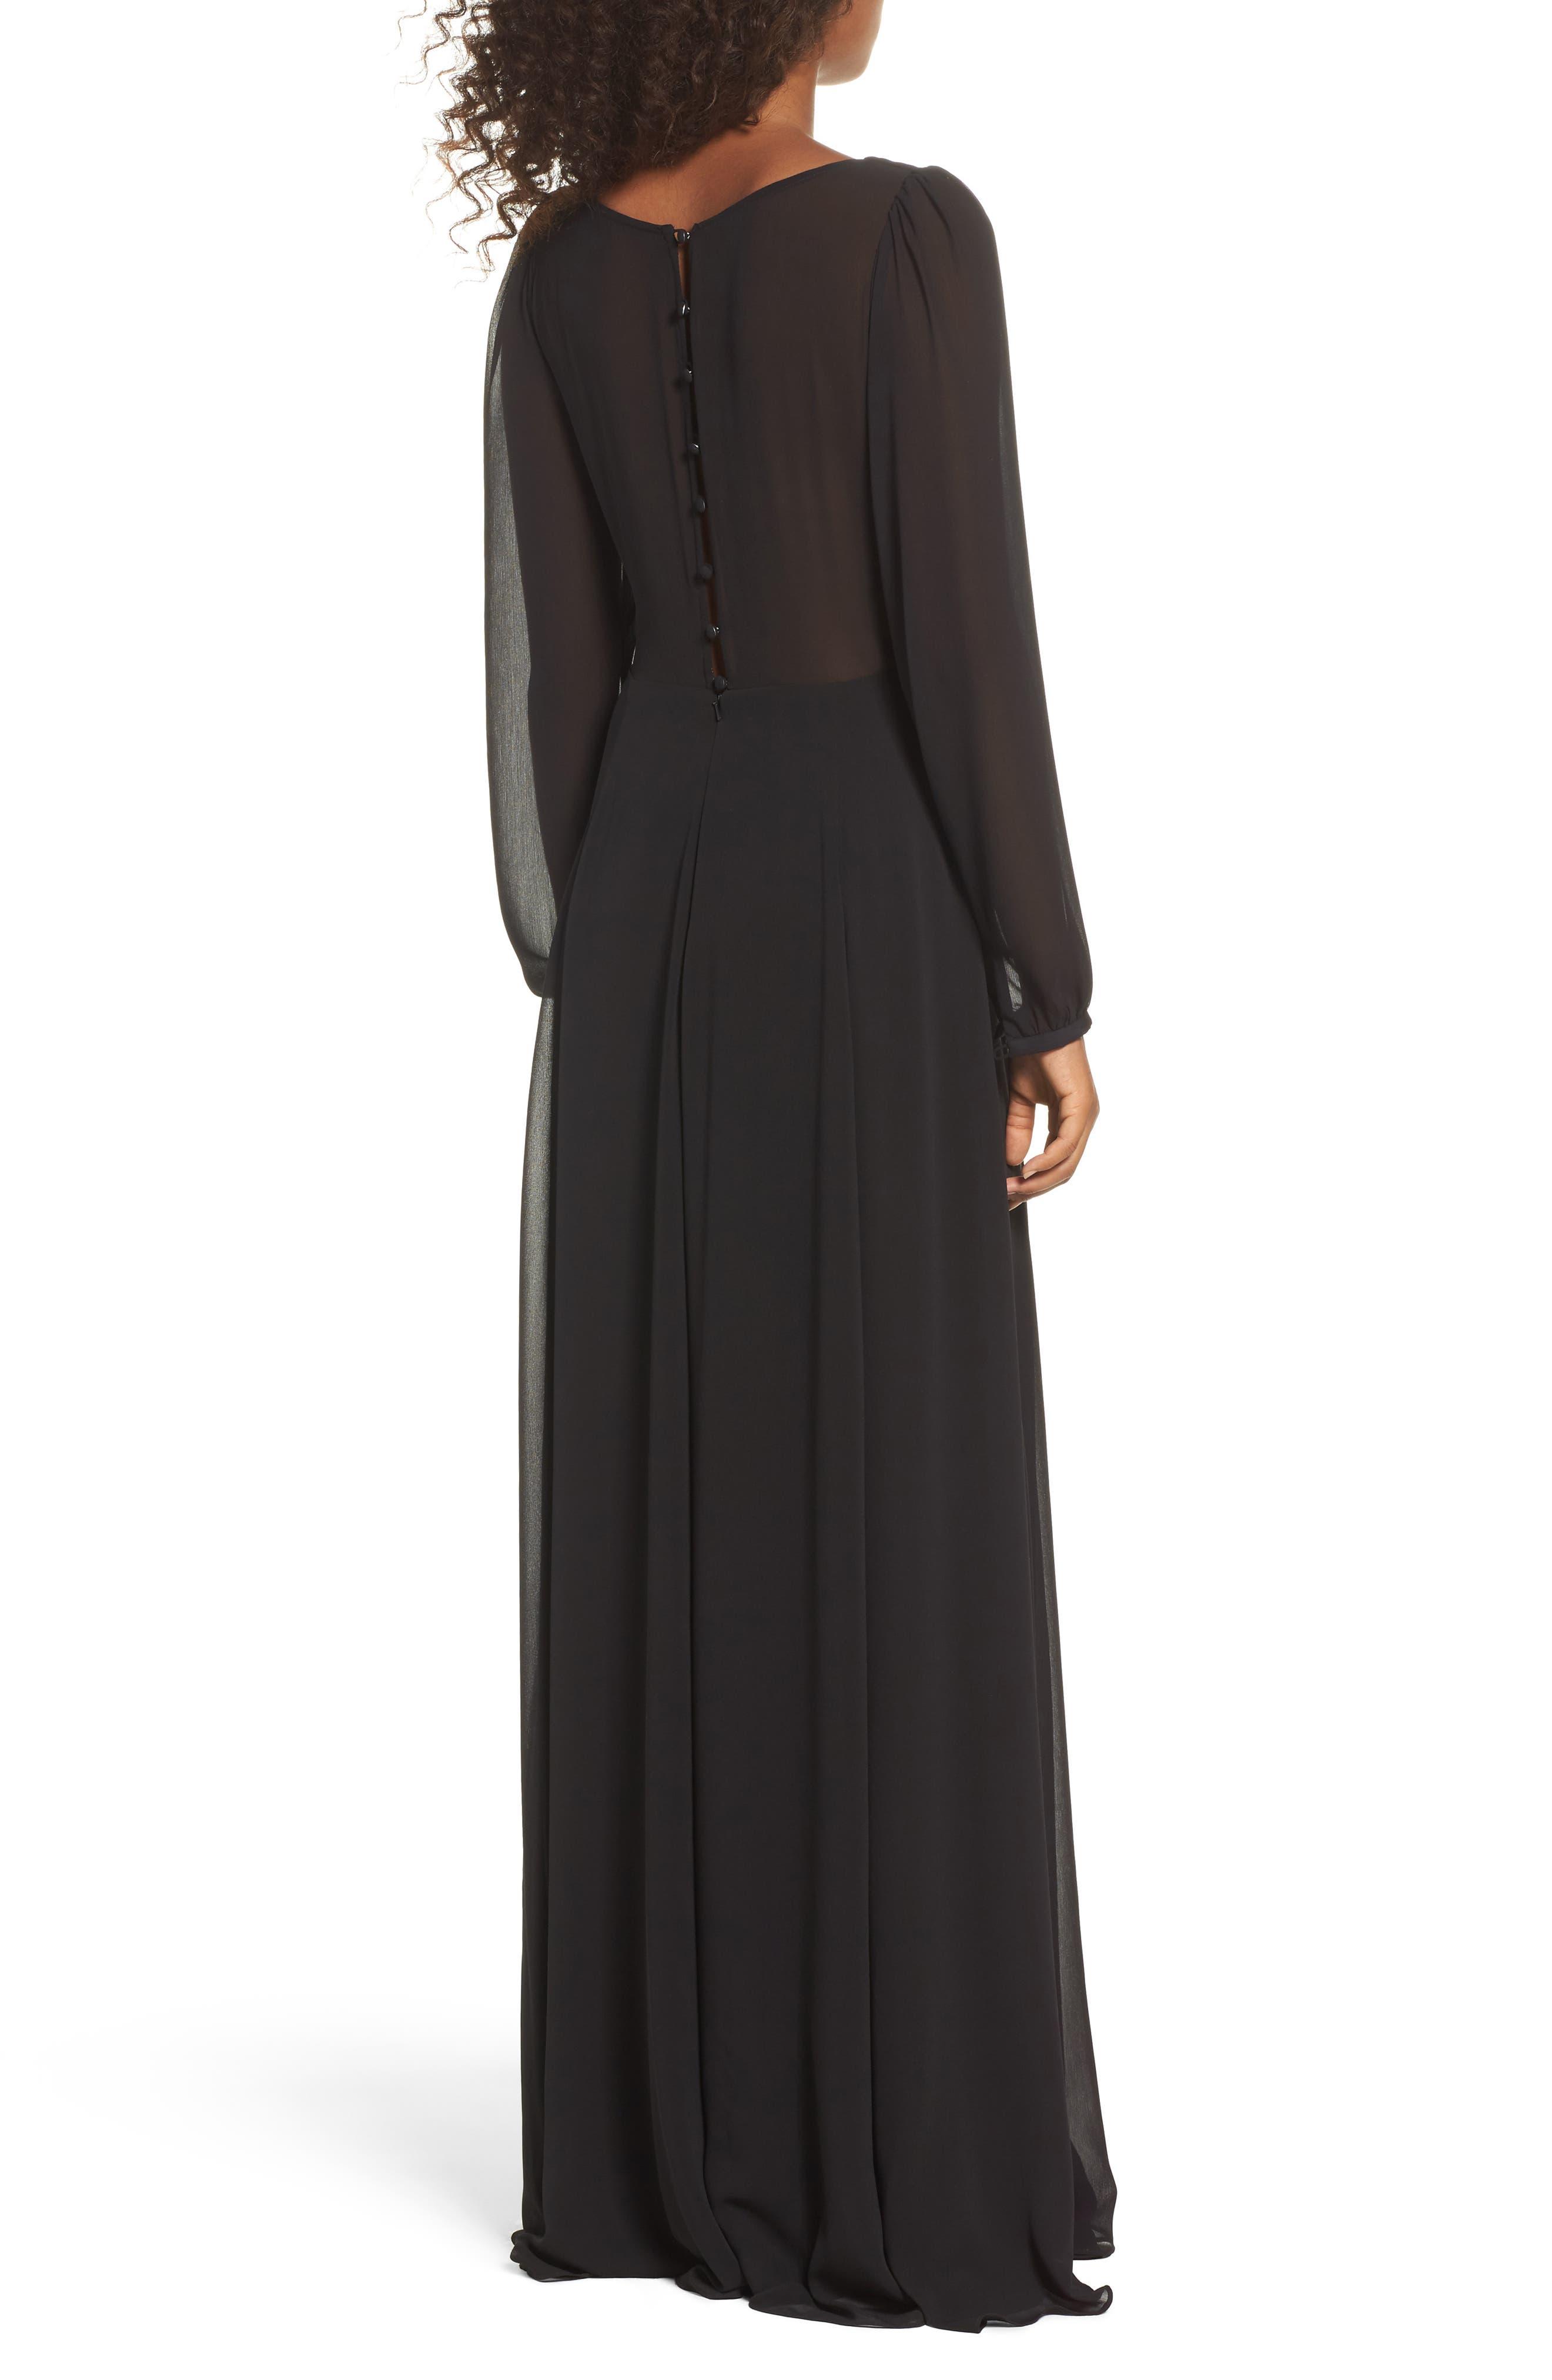 Donna Luxe Chiffon Surplice A-Line Gown,                             Alternate thumbnail 2, color,                             001